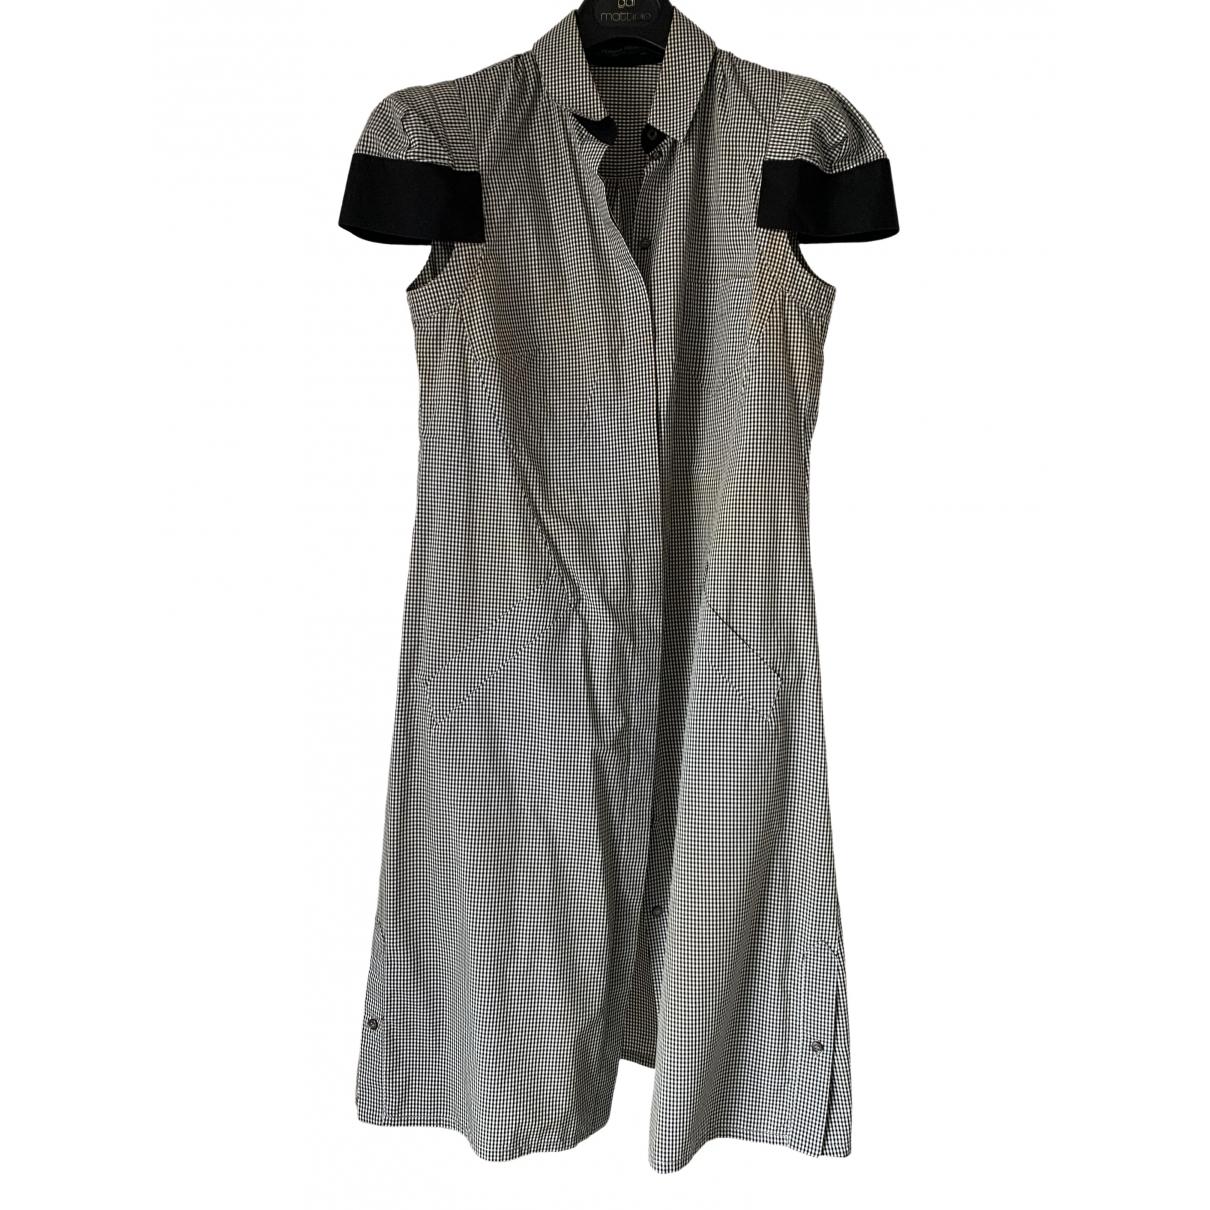 Alexander Mcqueen \N White Cotton dress for Women 42 IT